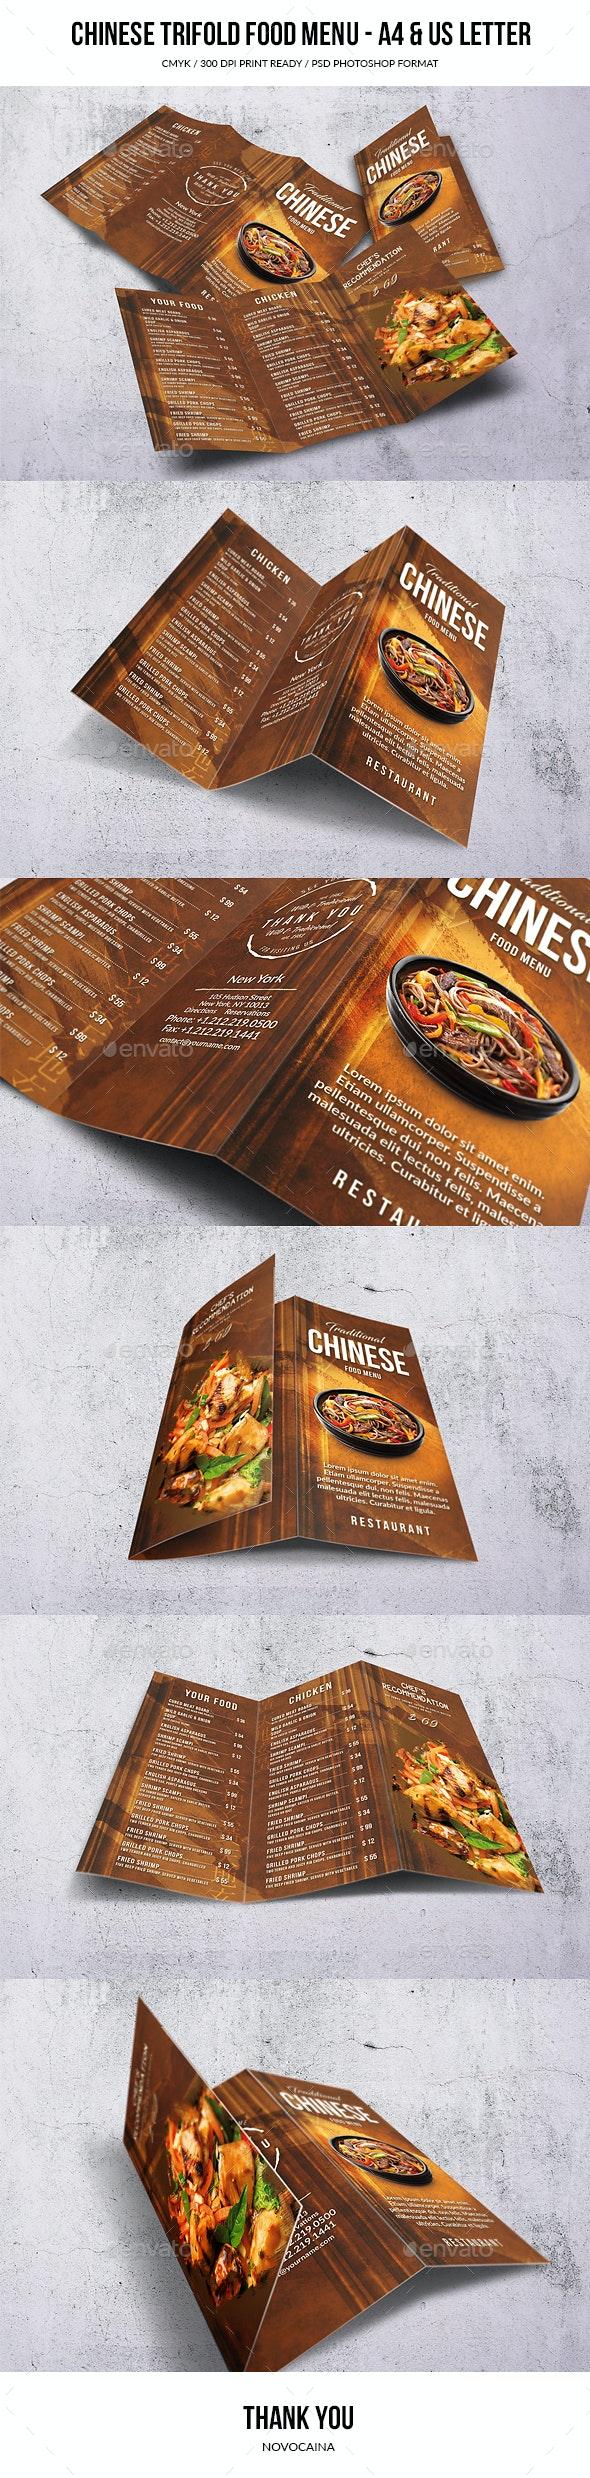 Chinese A4 & US Letter Trifold Food Menu - Food Menus Print Templates